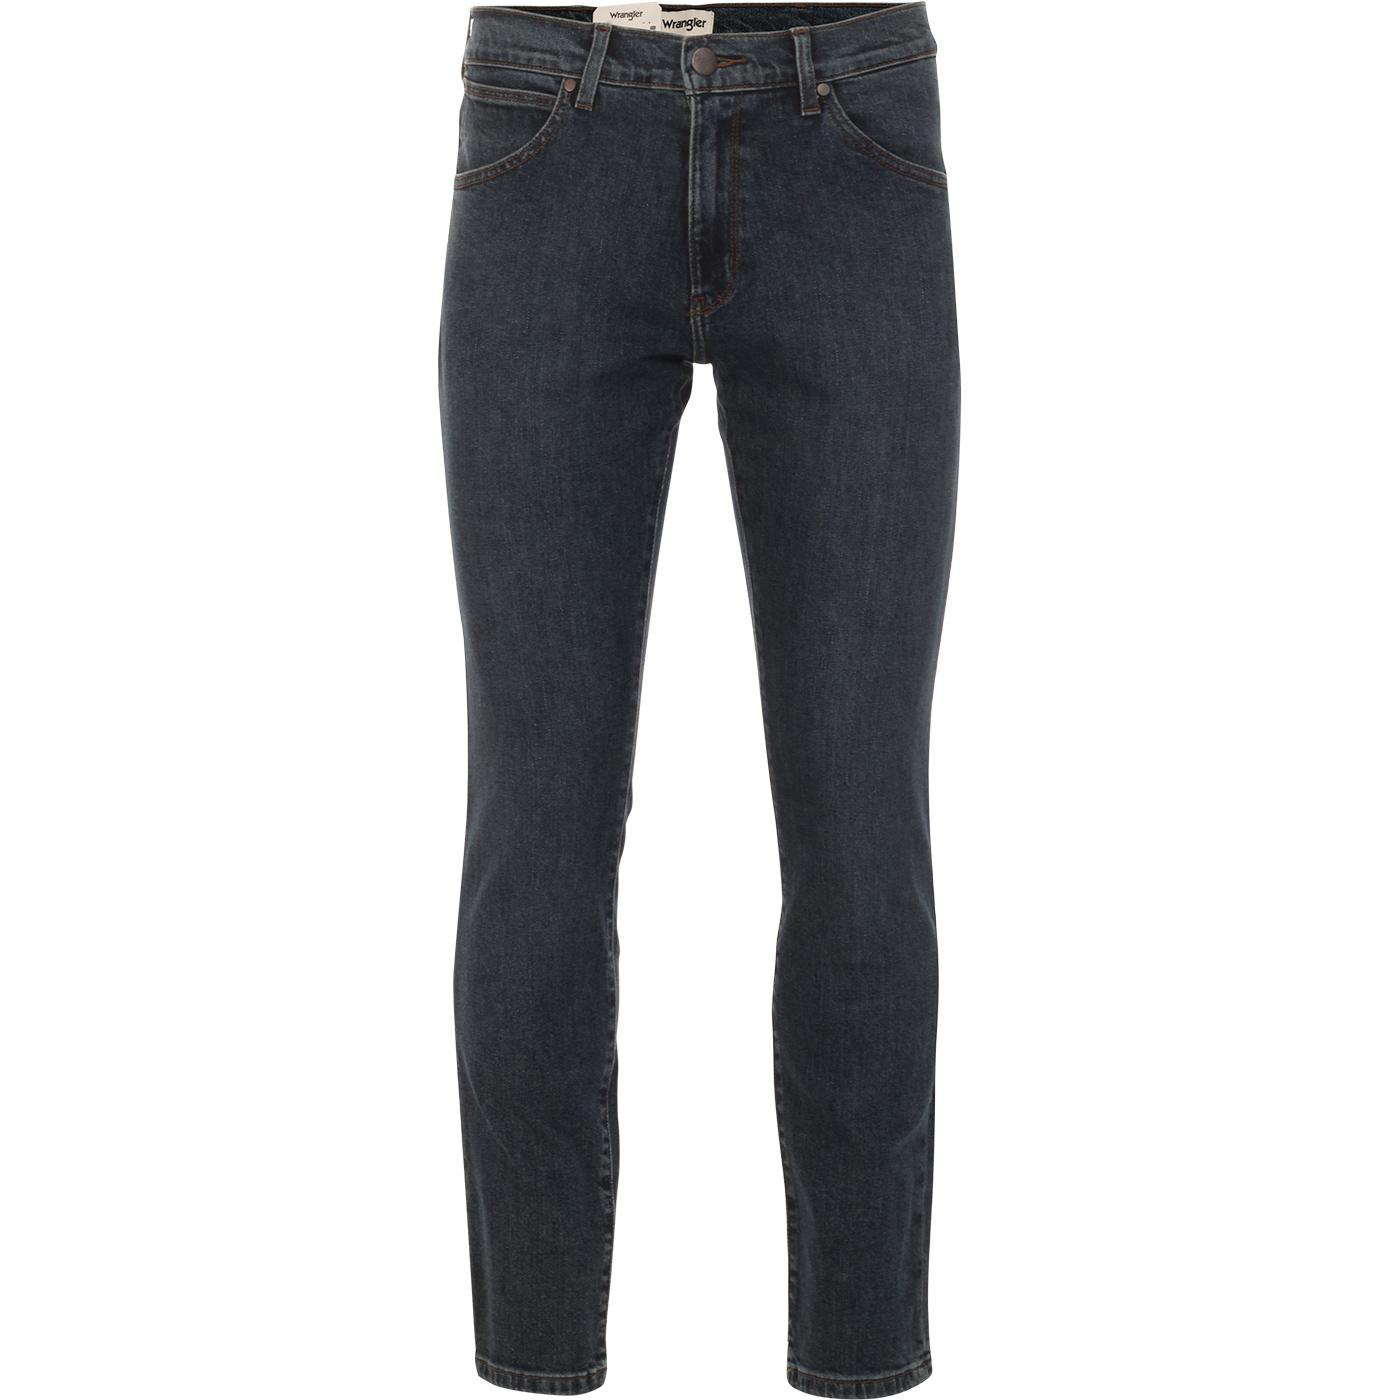 Larston WRANGLER Slim Tapered Denim Jeans CG